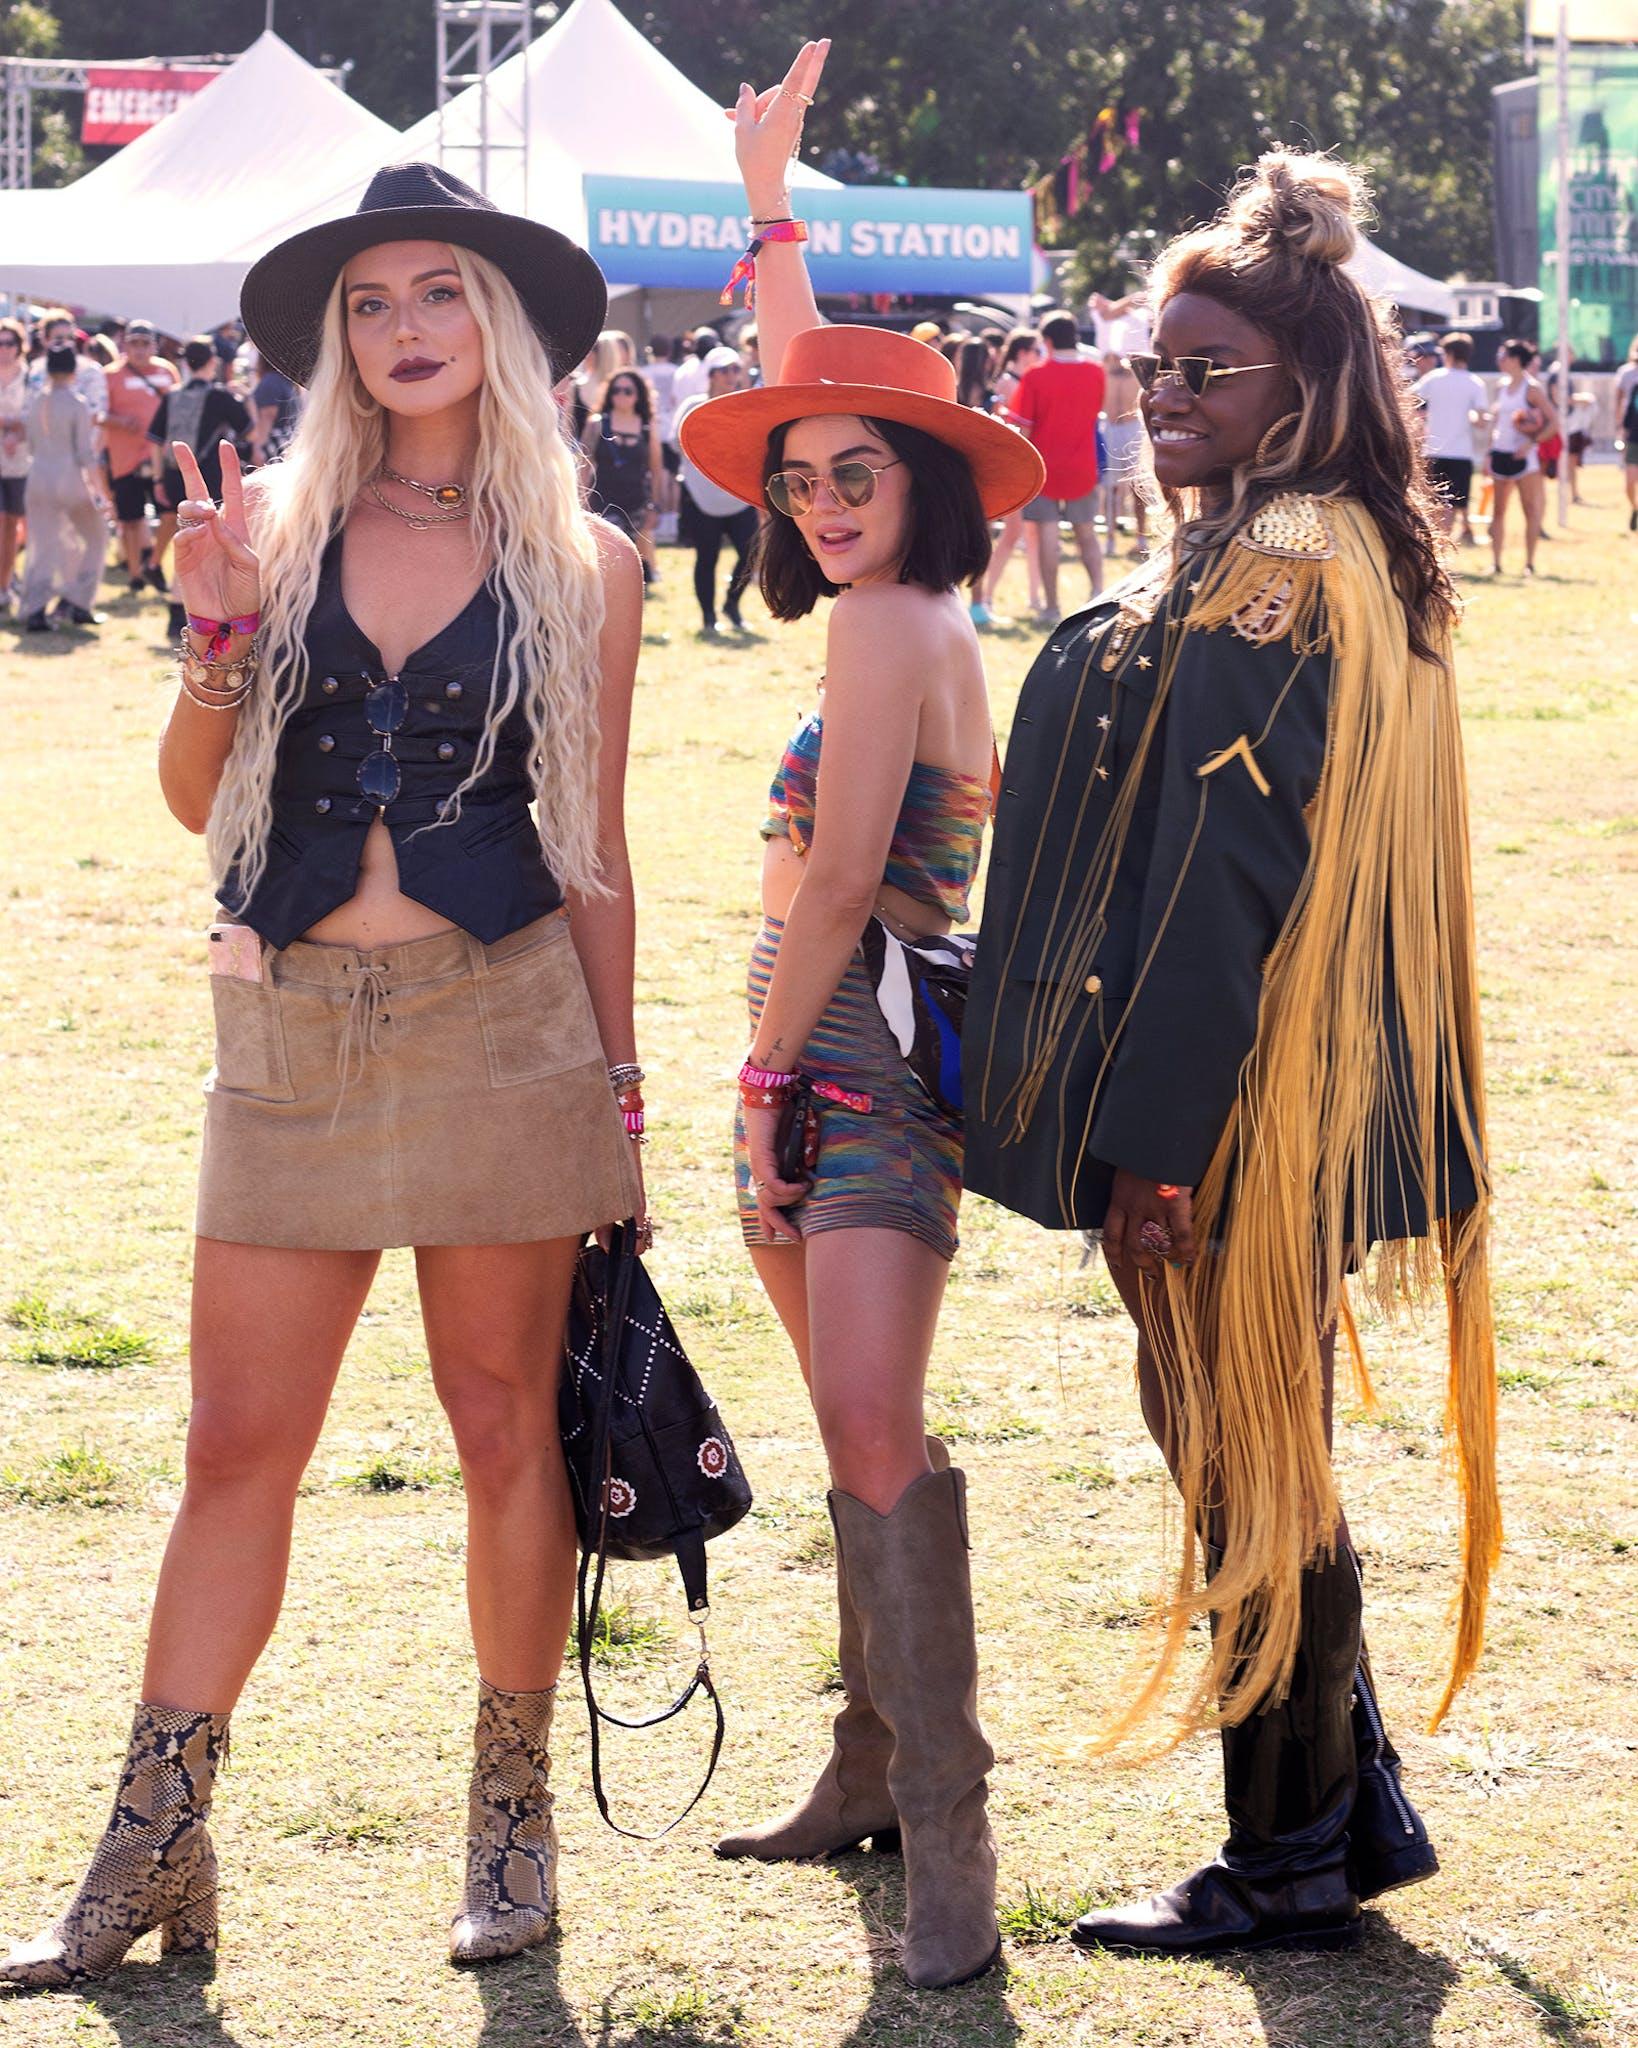 ACL Festival Fashion 2021